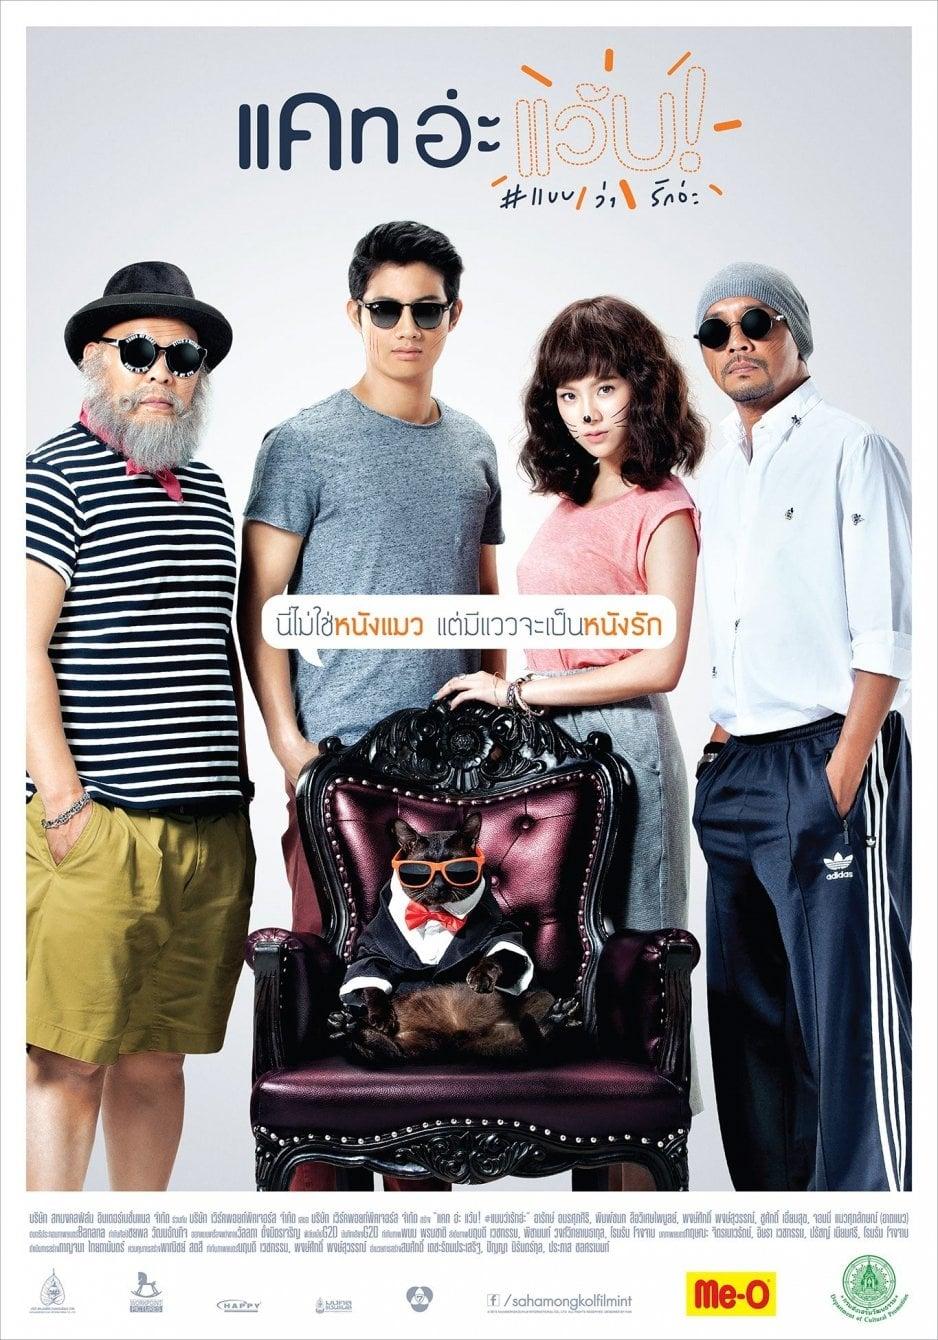 phim Thái Lan mèo mai mối Baifern Pimchanok